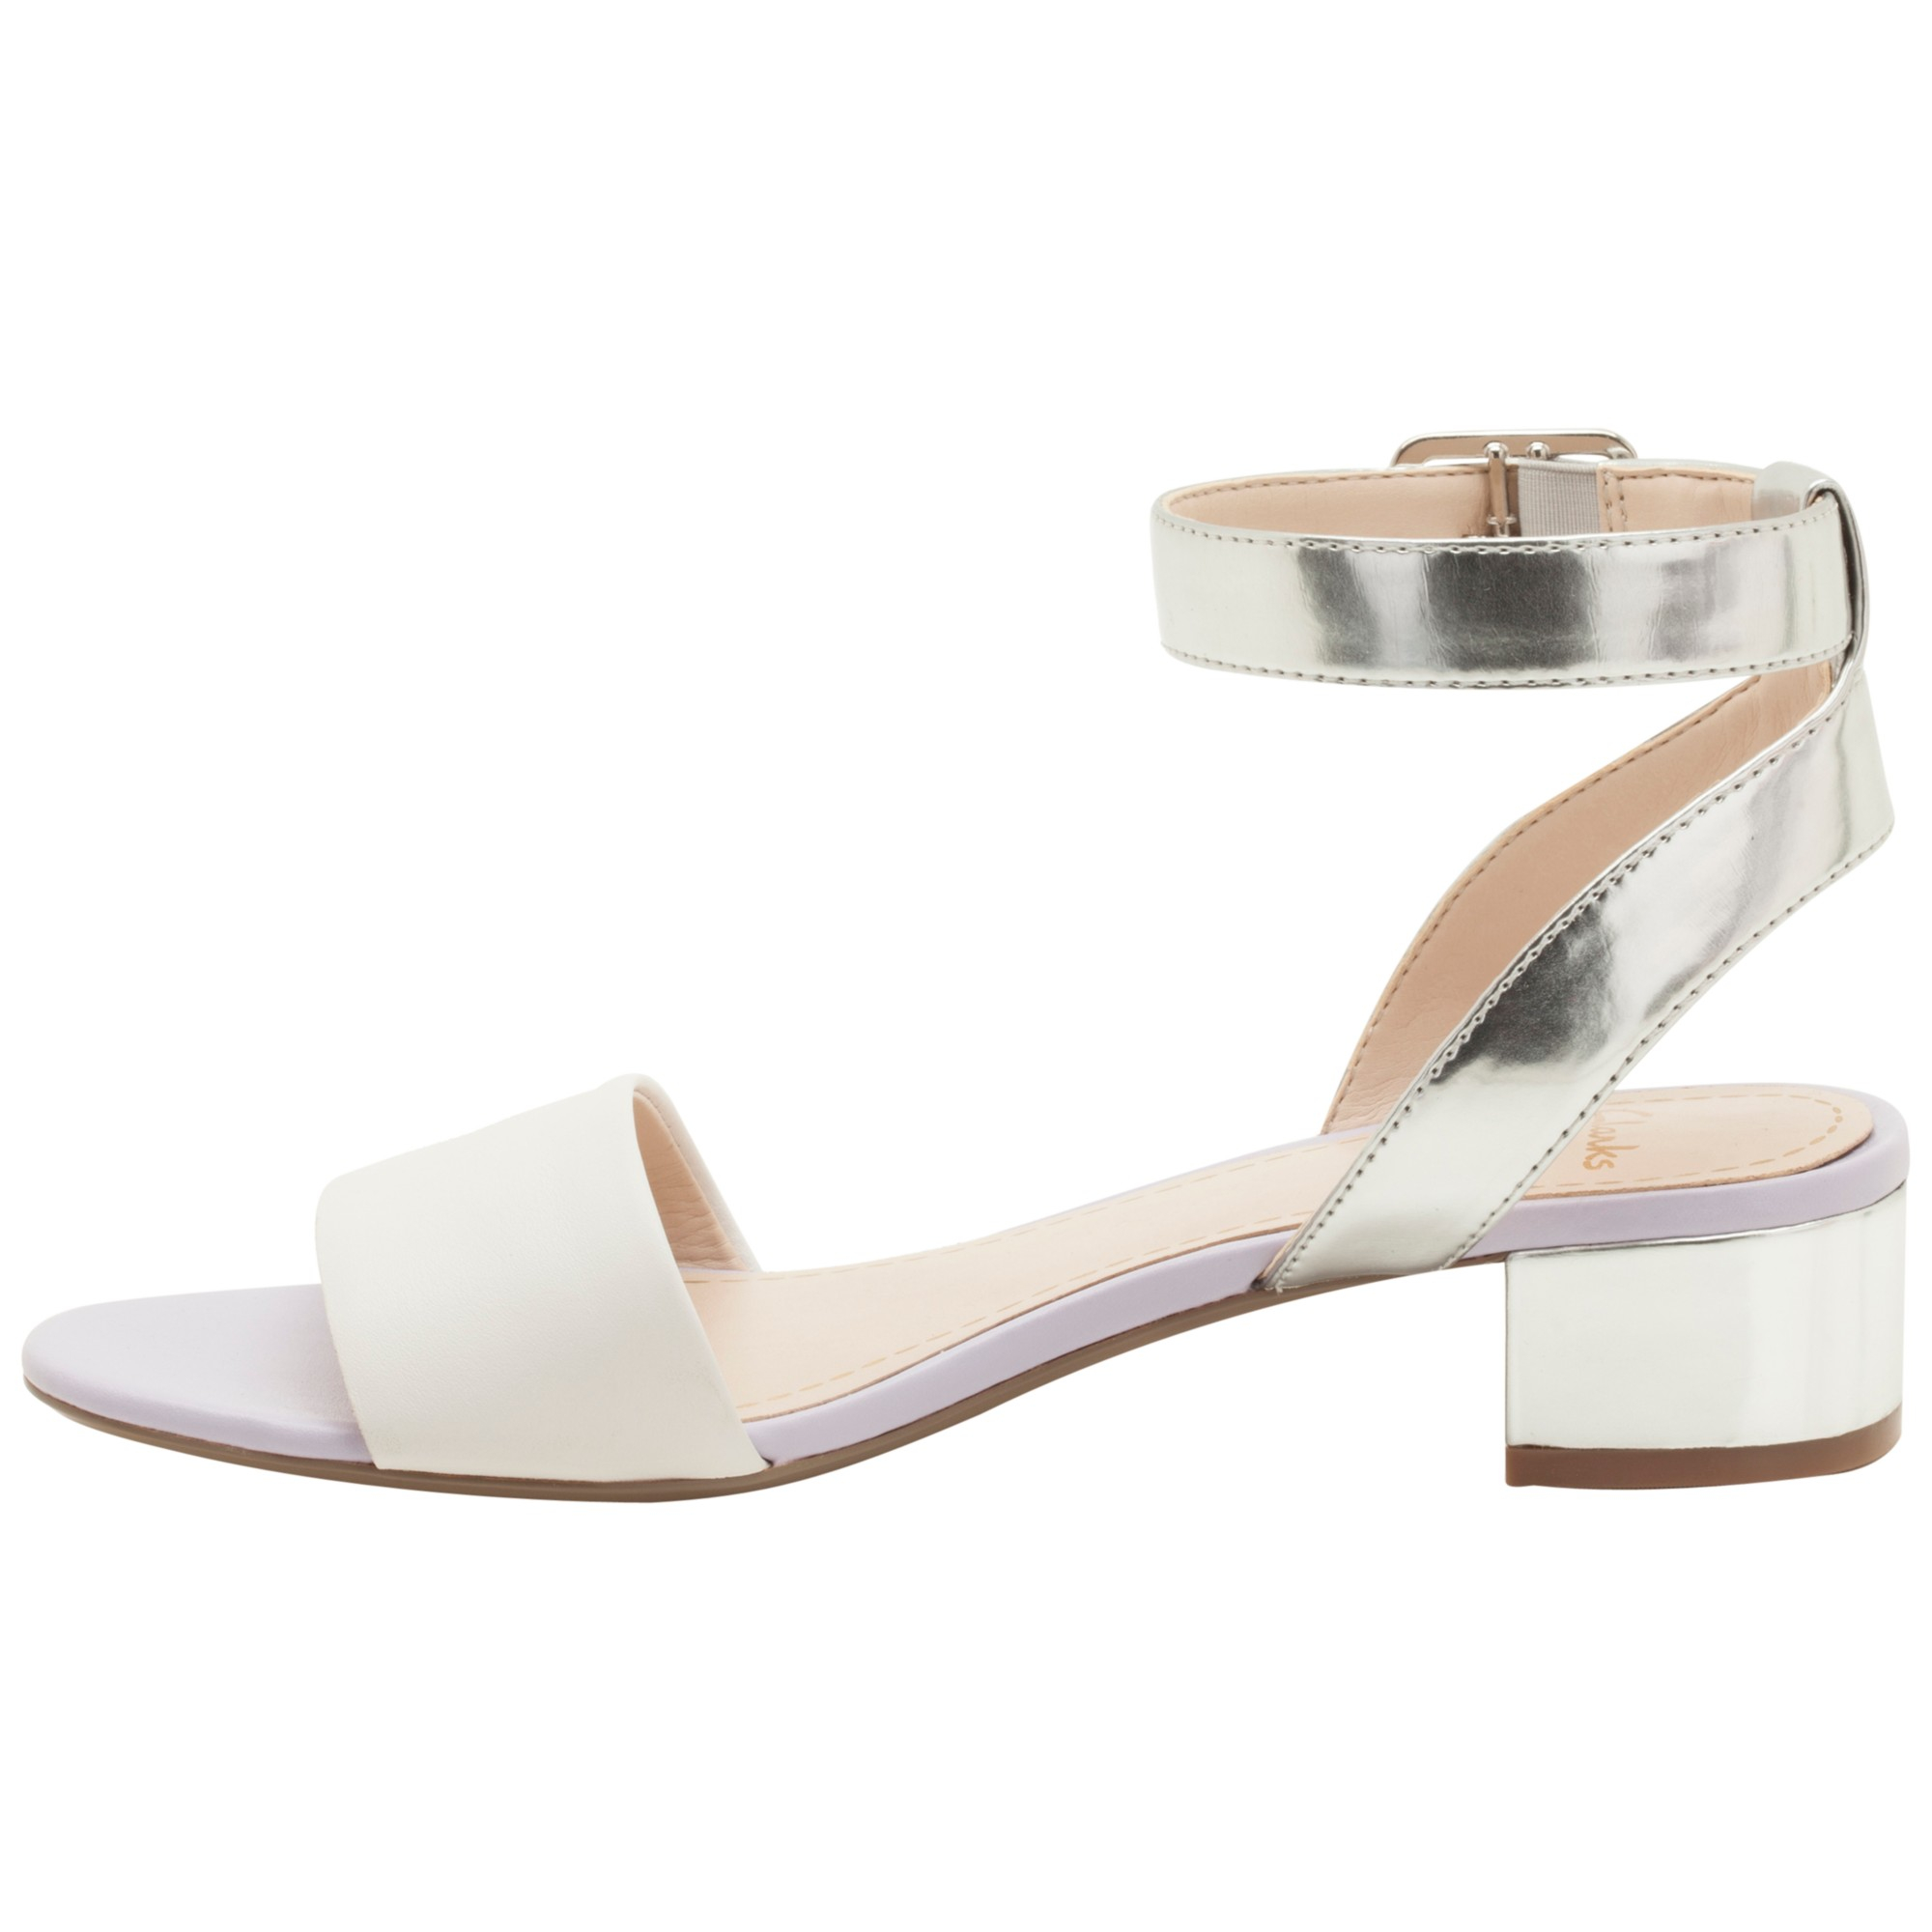 2cc742e12715e2 Clarks Sharna Balcony Sandals in White - Lyst